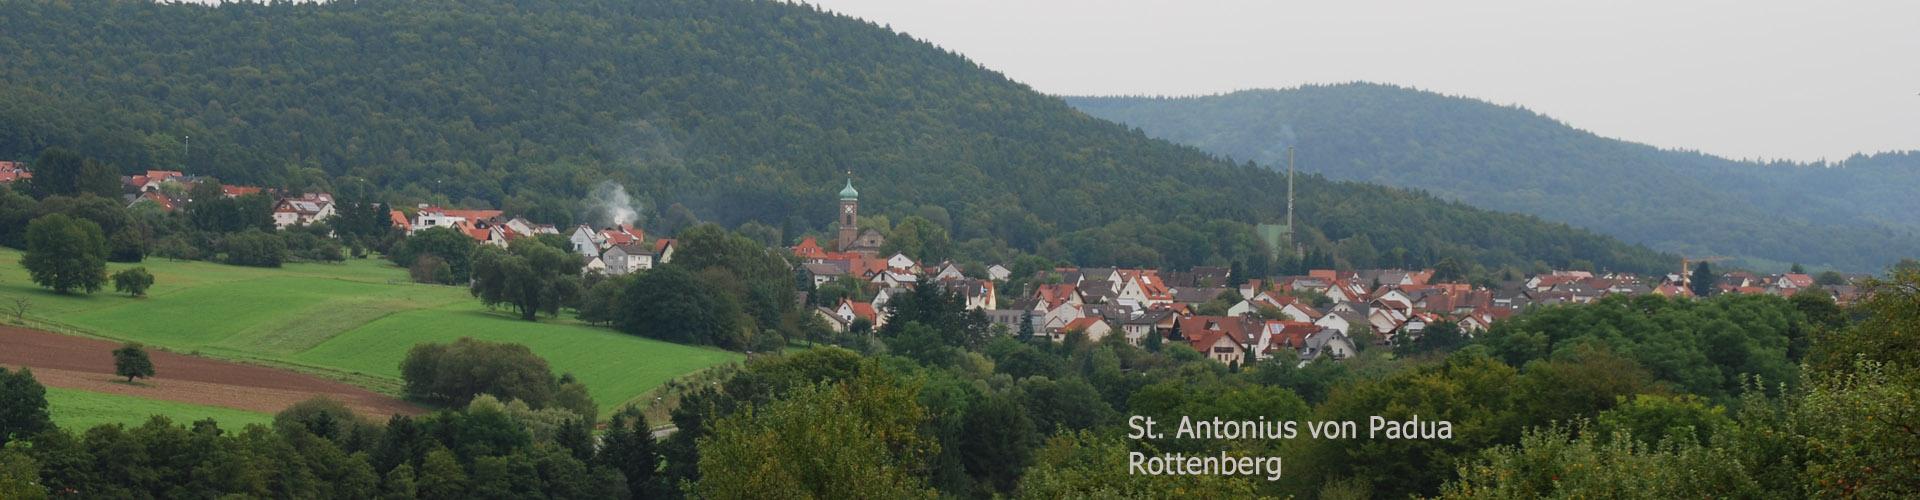 DSC_7829 Rottenberg